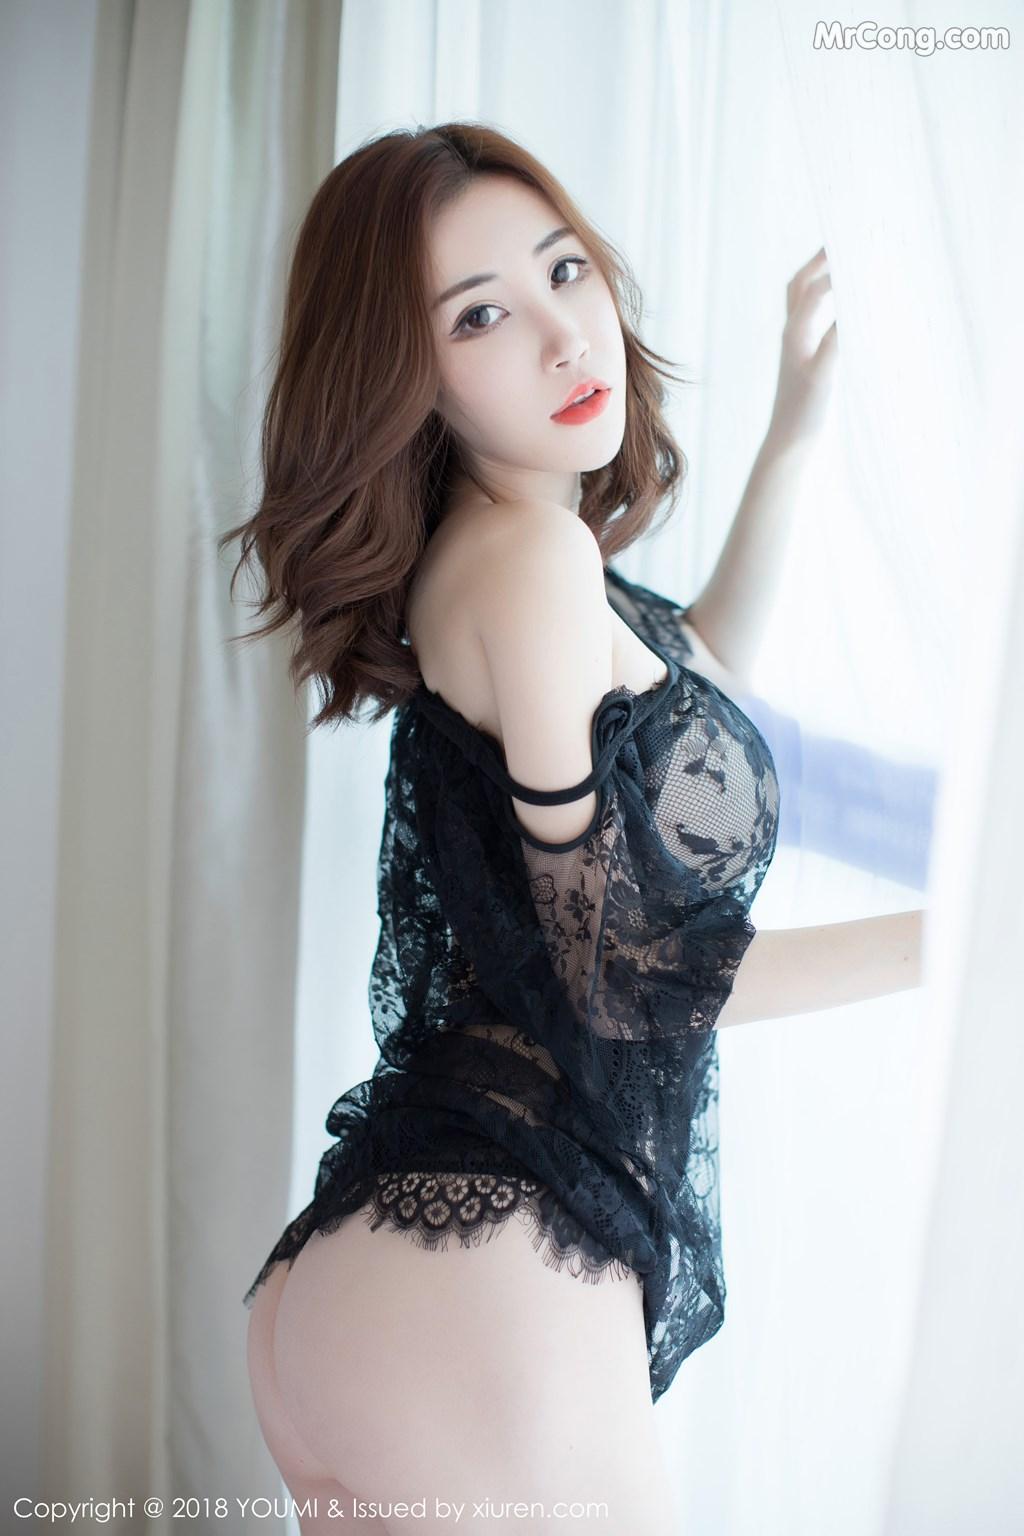 Image YouMi-Vol.219-Sun-Meng-Yao-V-MrCong.com-005 in post YouMi Vol.219: Người mẫu Sun Meng Yao (孙梦瑶V) (48 ảnh)